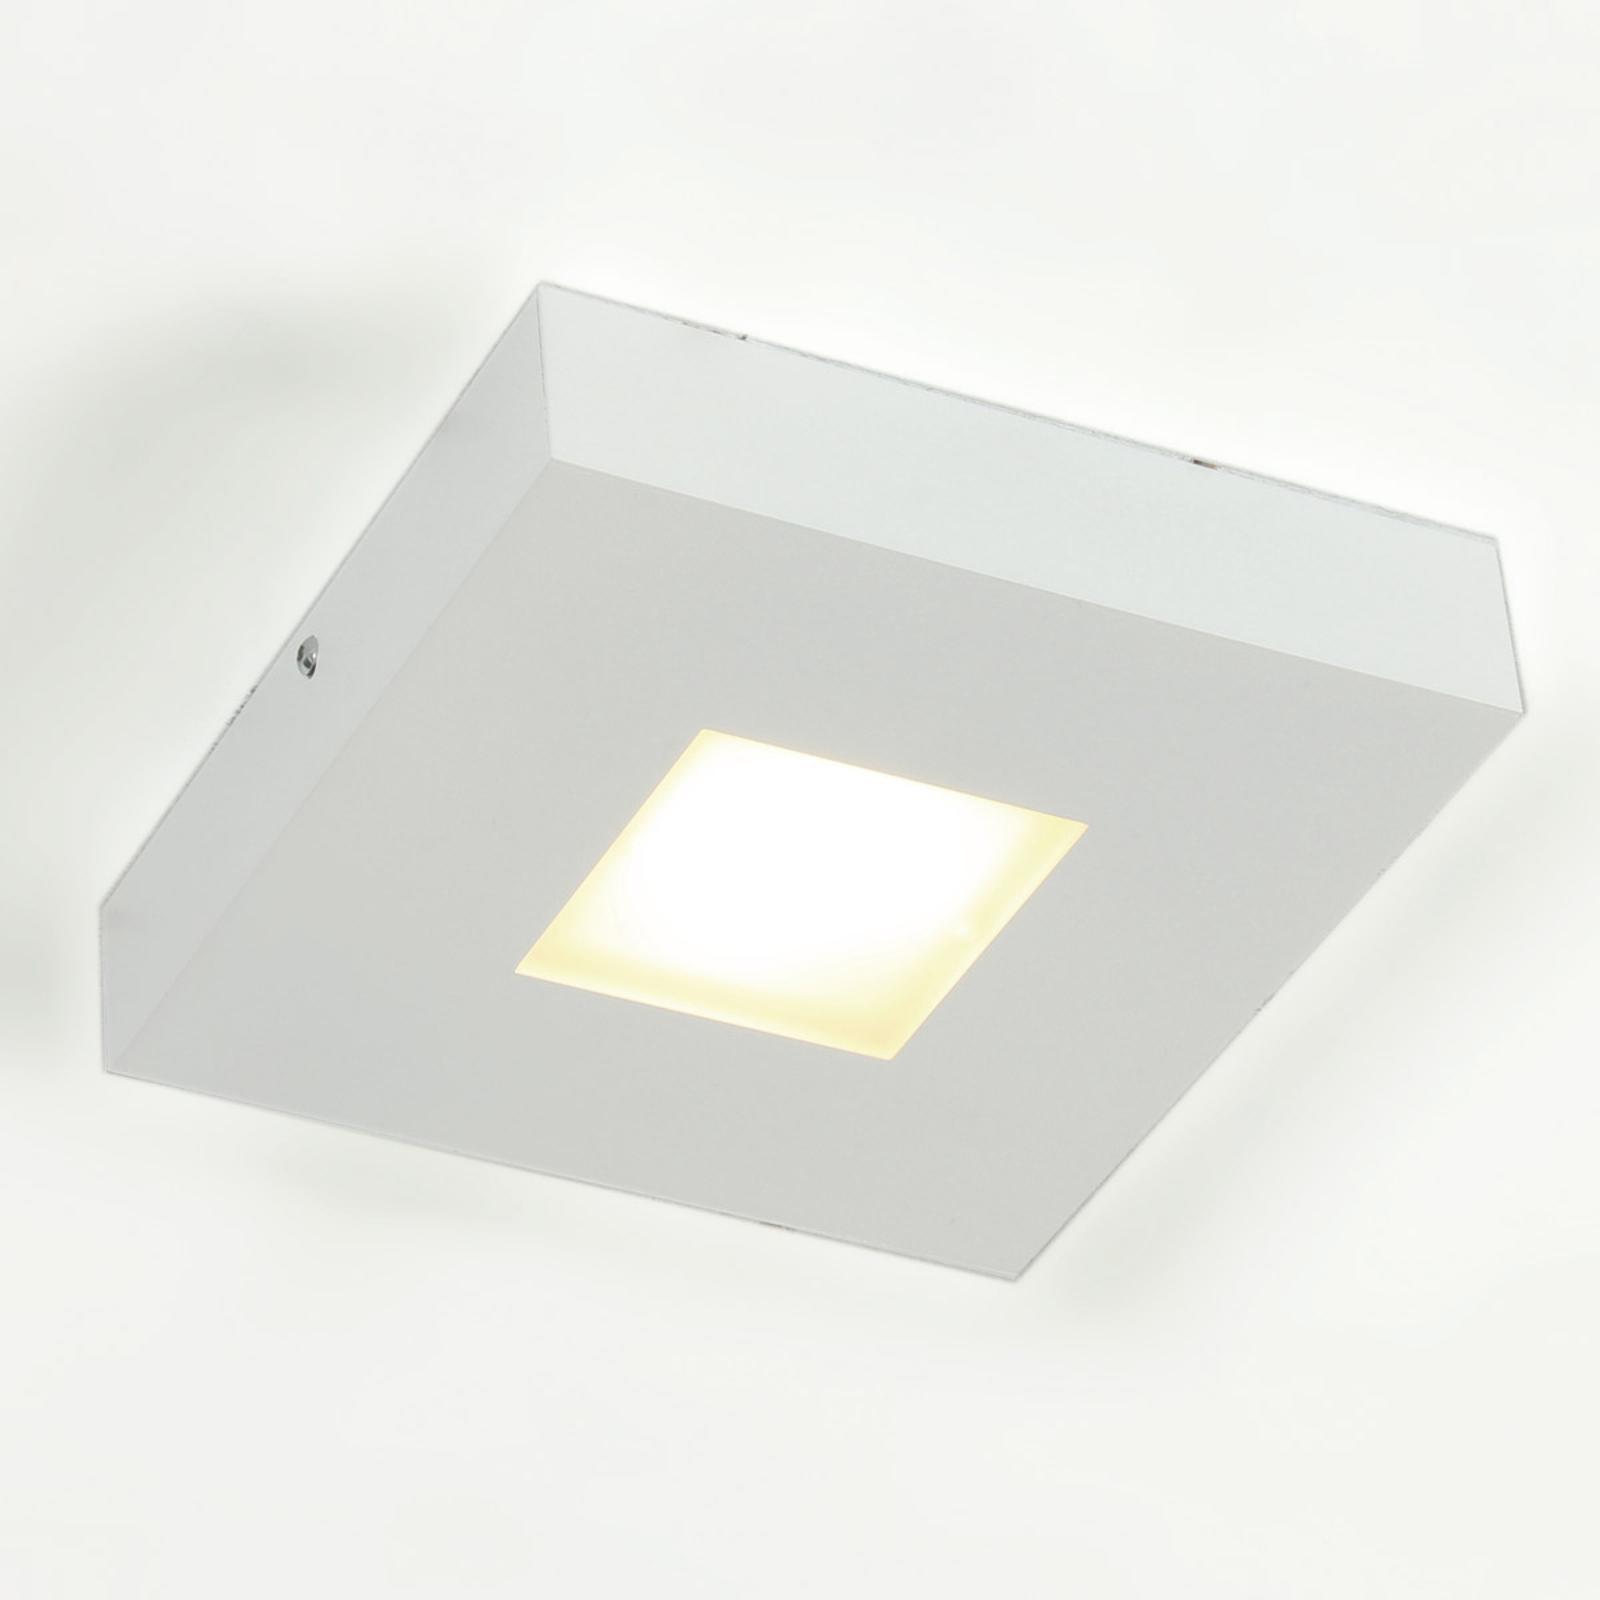 Bopp Cubus - hochwertige LED-Deckenlampe, weiß